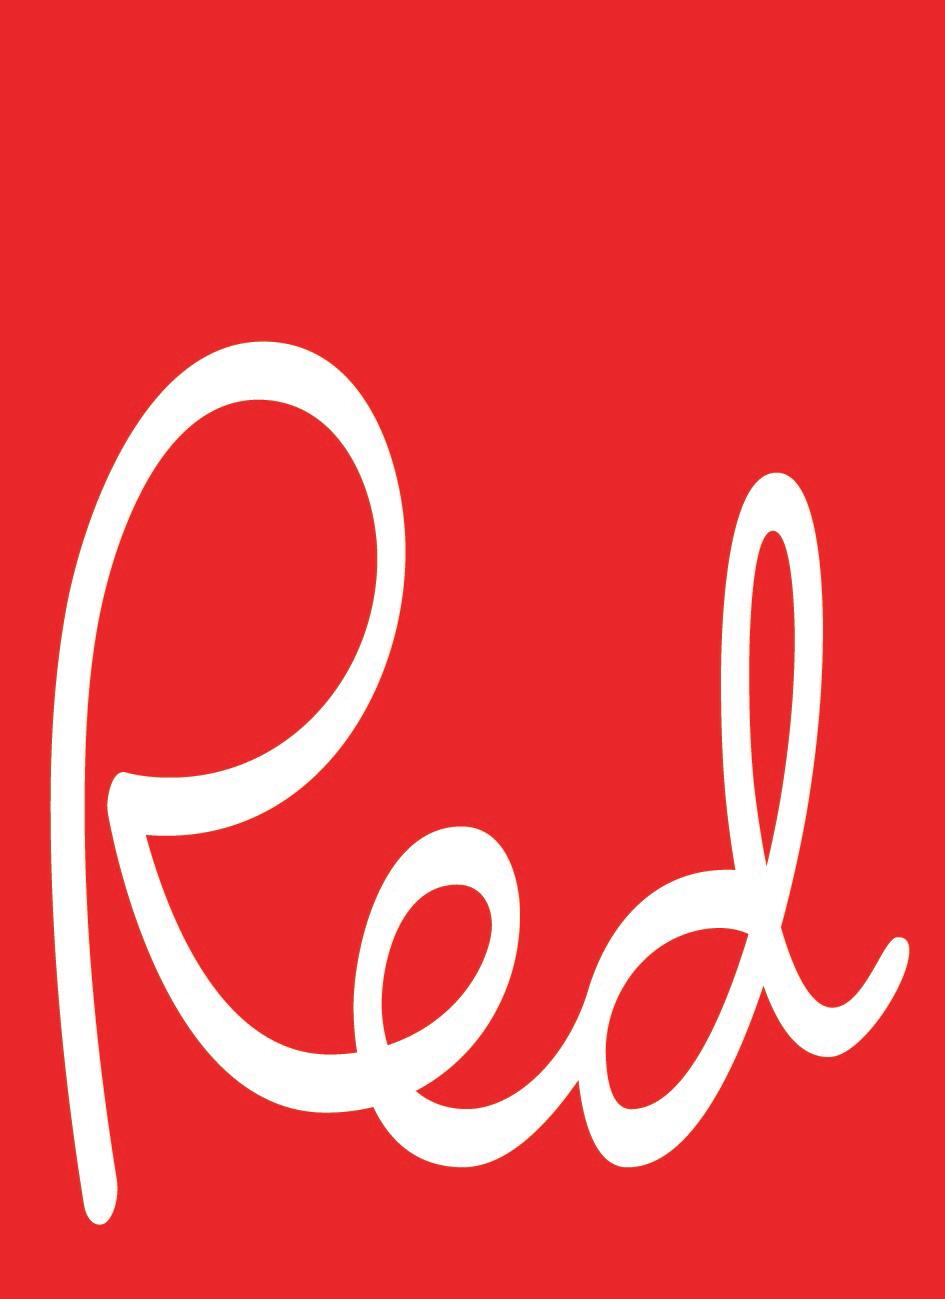 red-logo-magazine-c.png